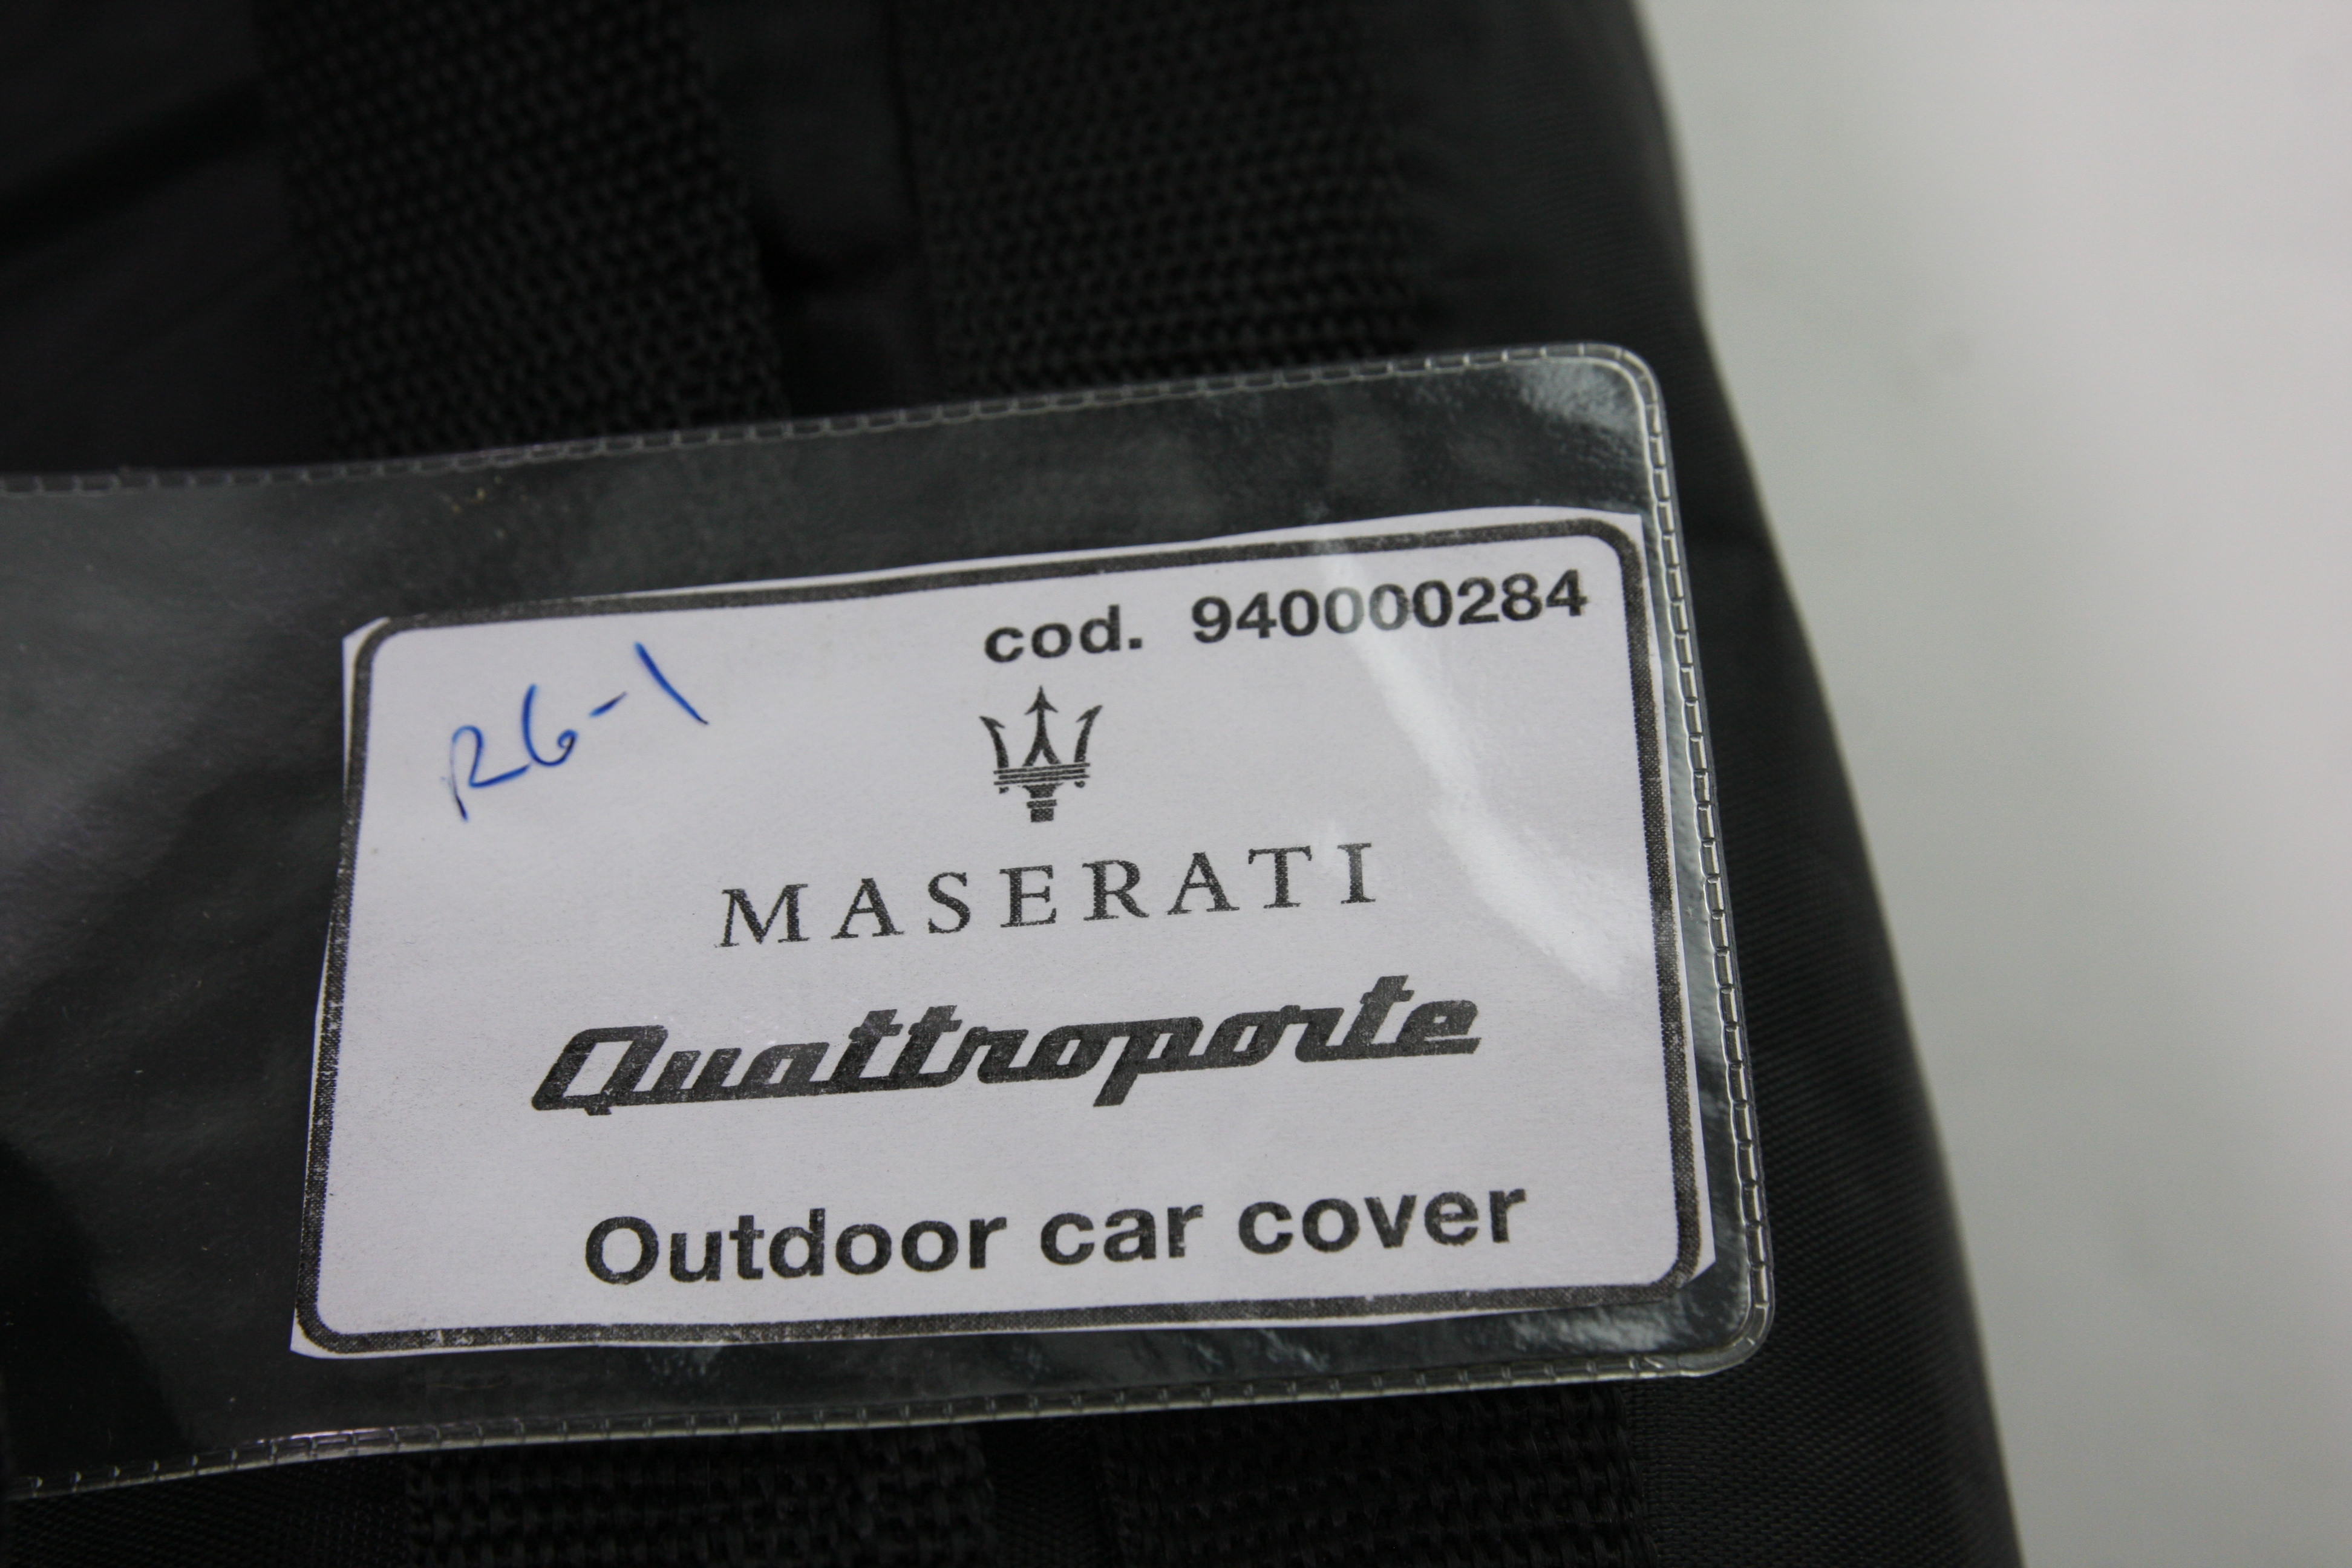 New OEM 940000284 Genuine Maserati Quattroporte Outdoor Car Cover Free Shipping - image 2